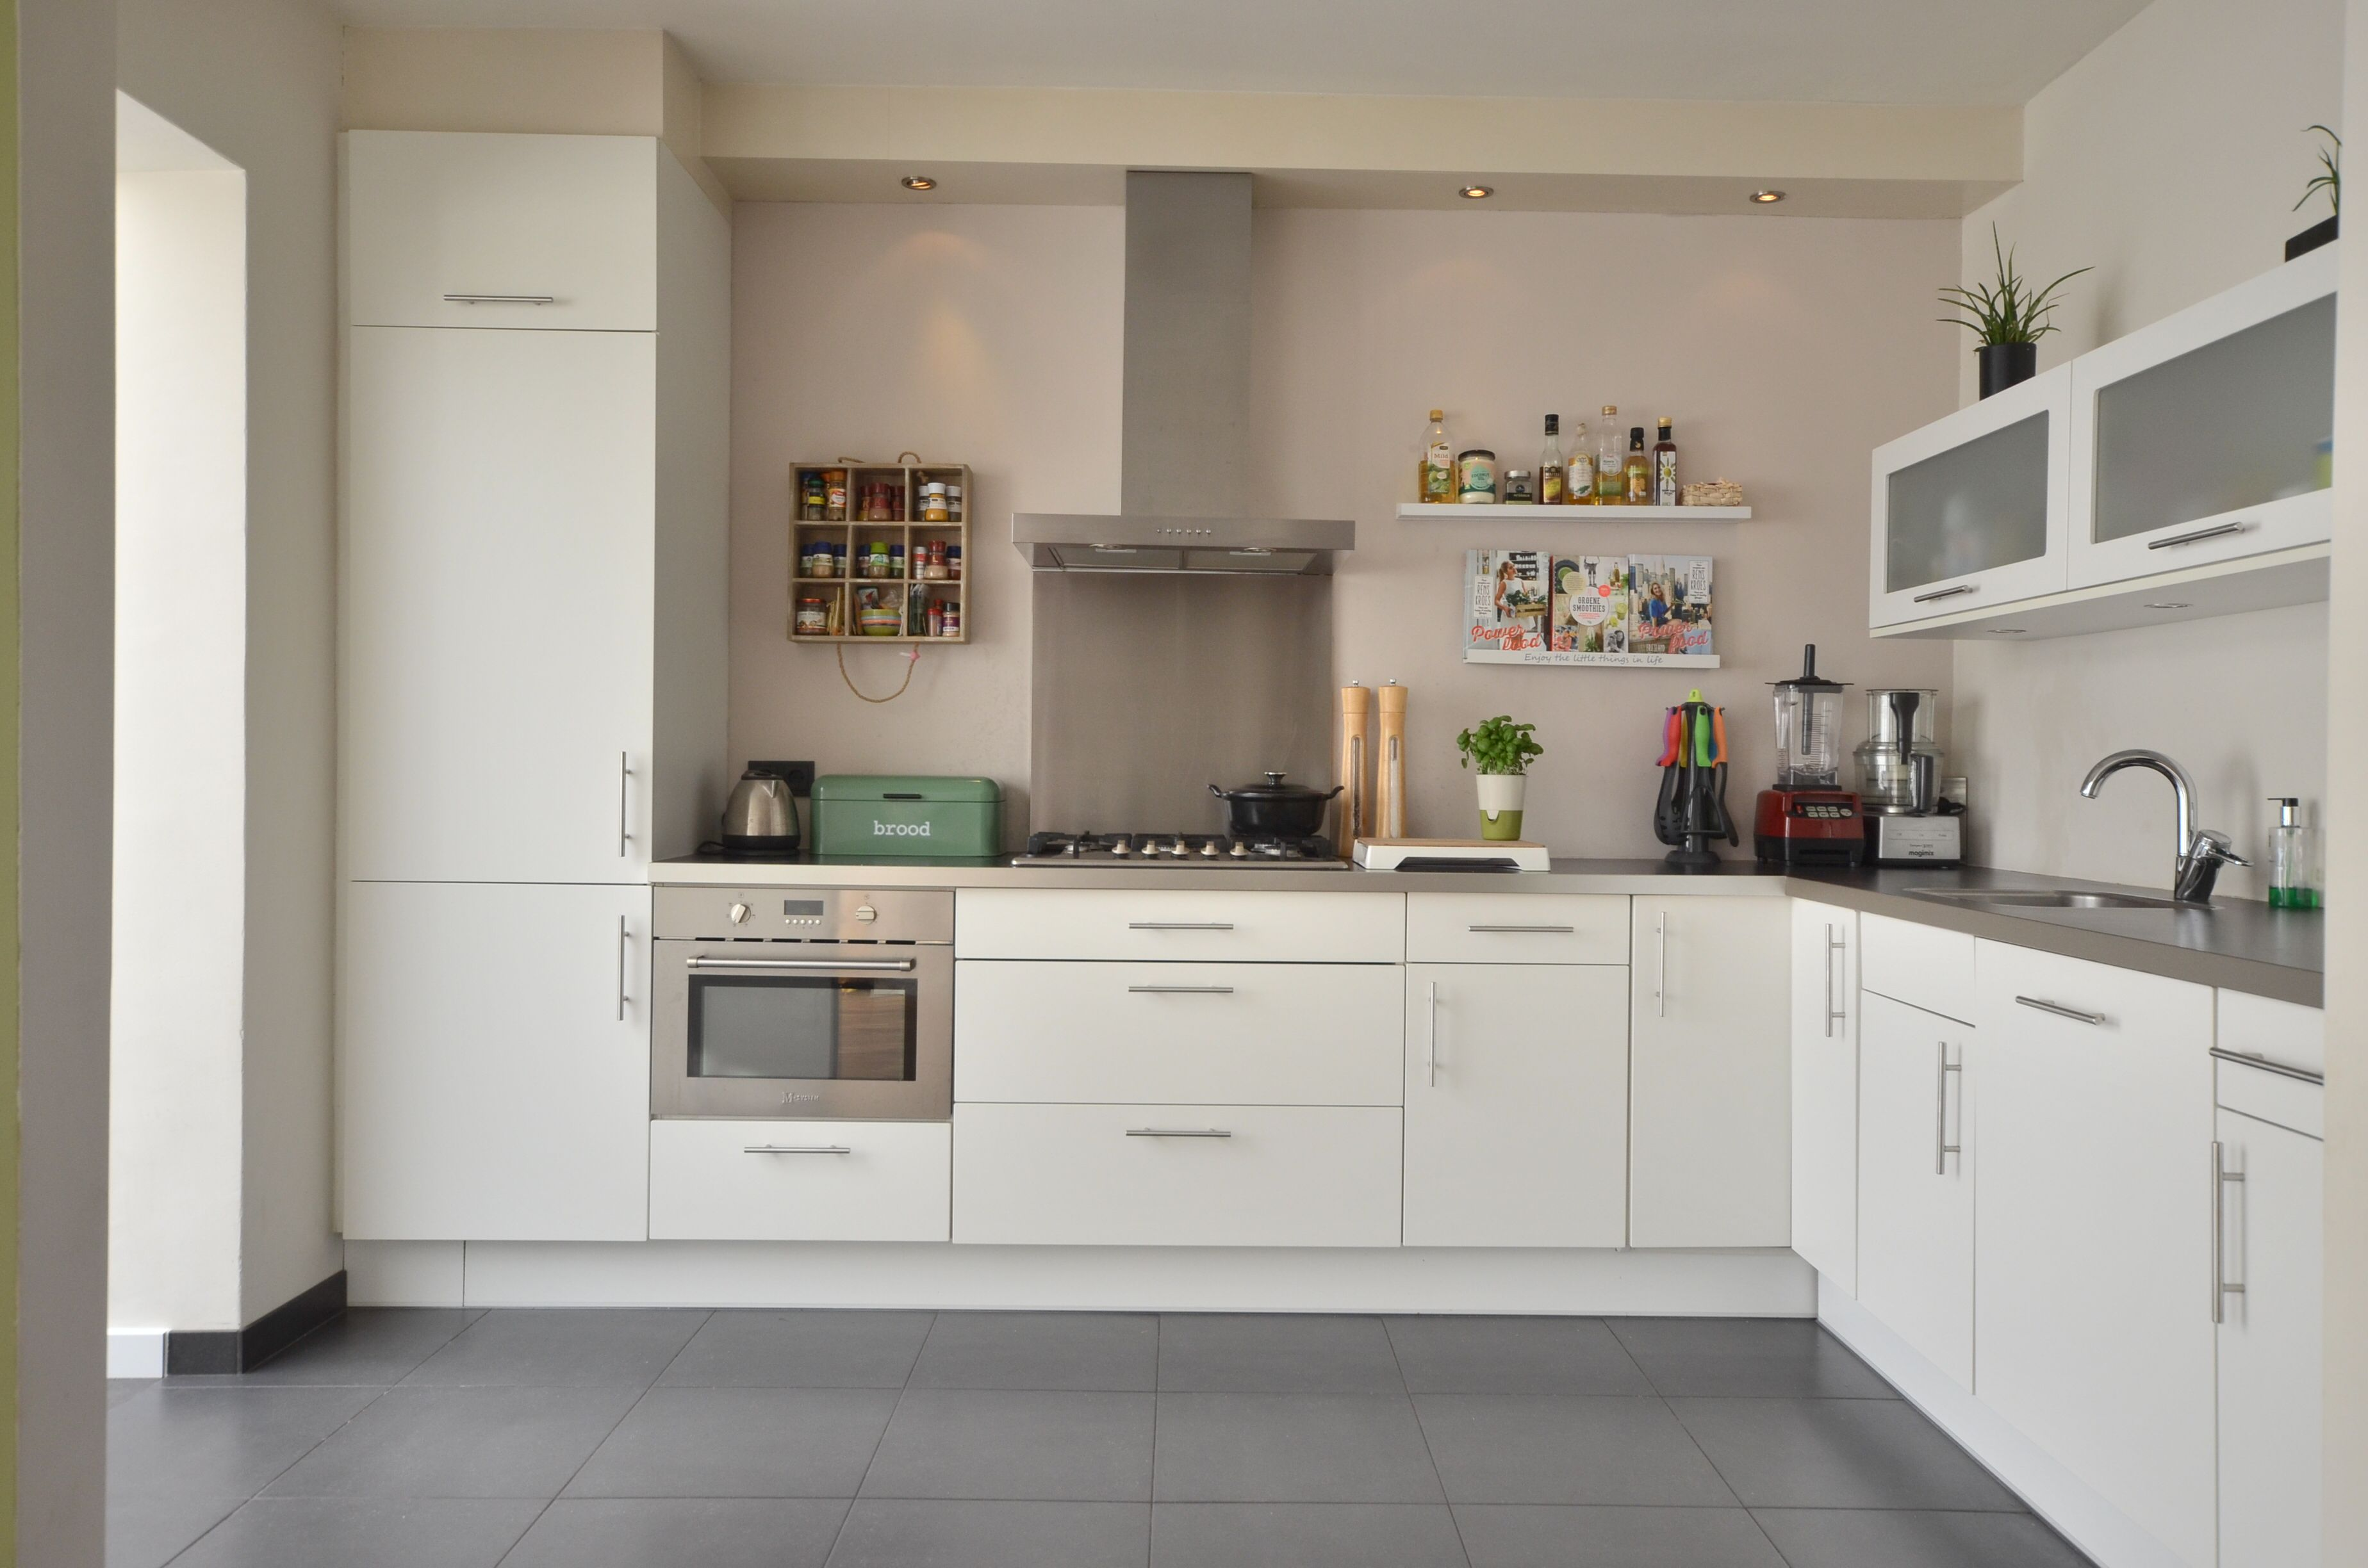 Inspiratie Aankleding Keuken : Strakke keuken met vintage aankleding keukens